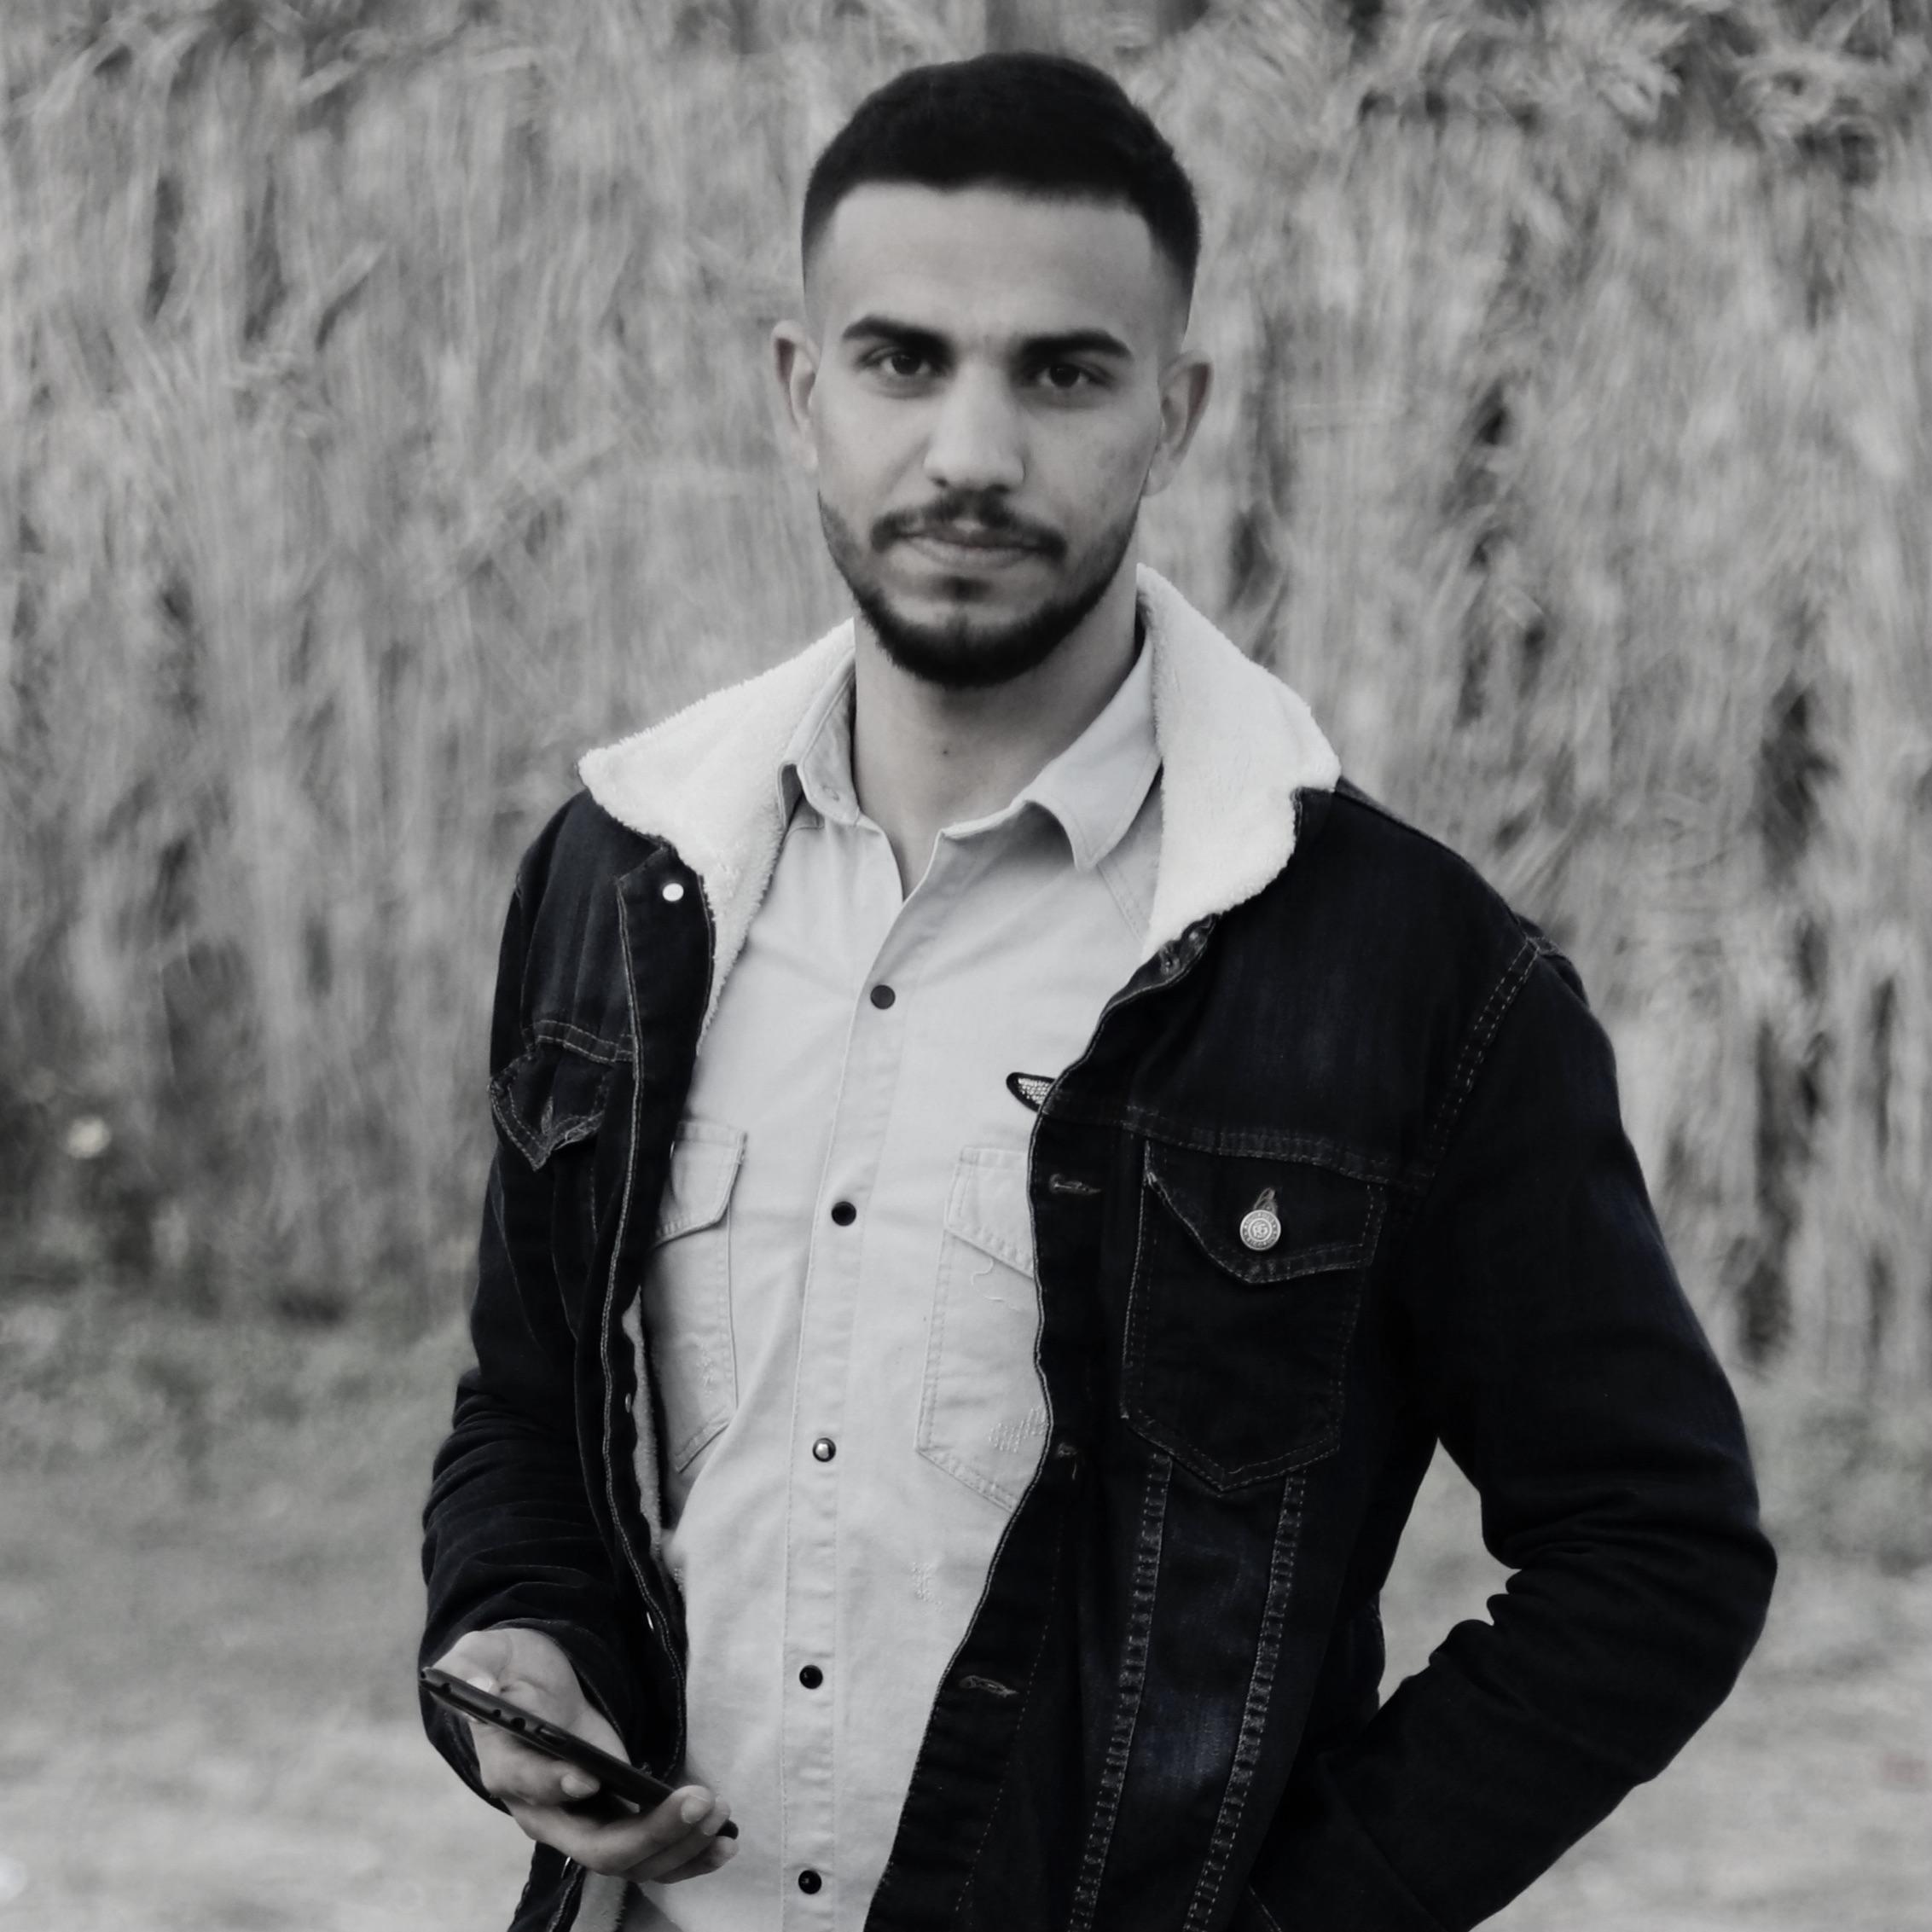 Fuad Abu Khammash